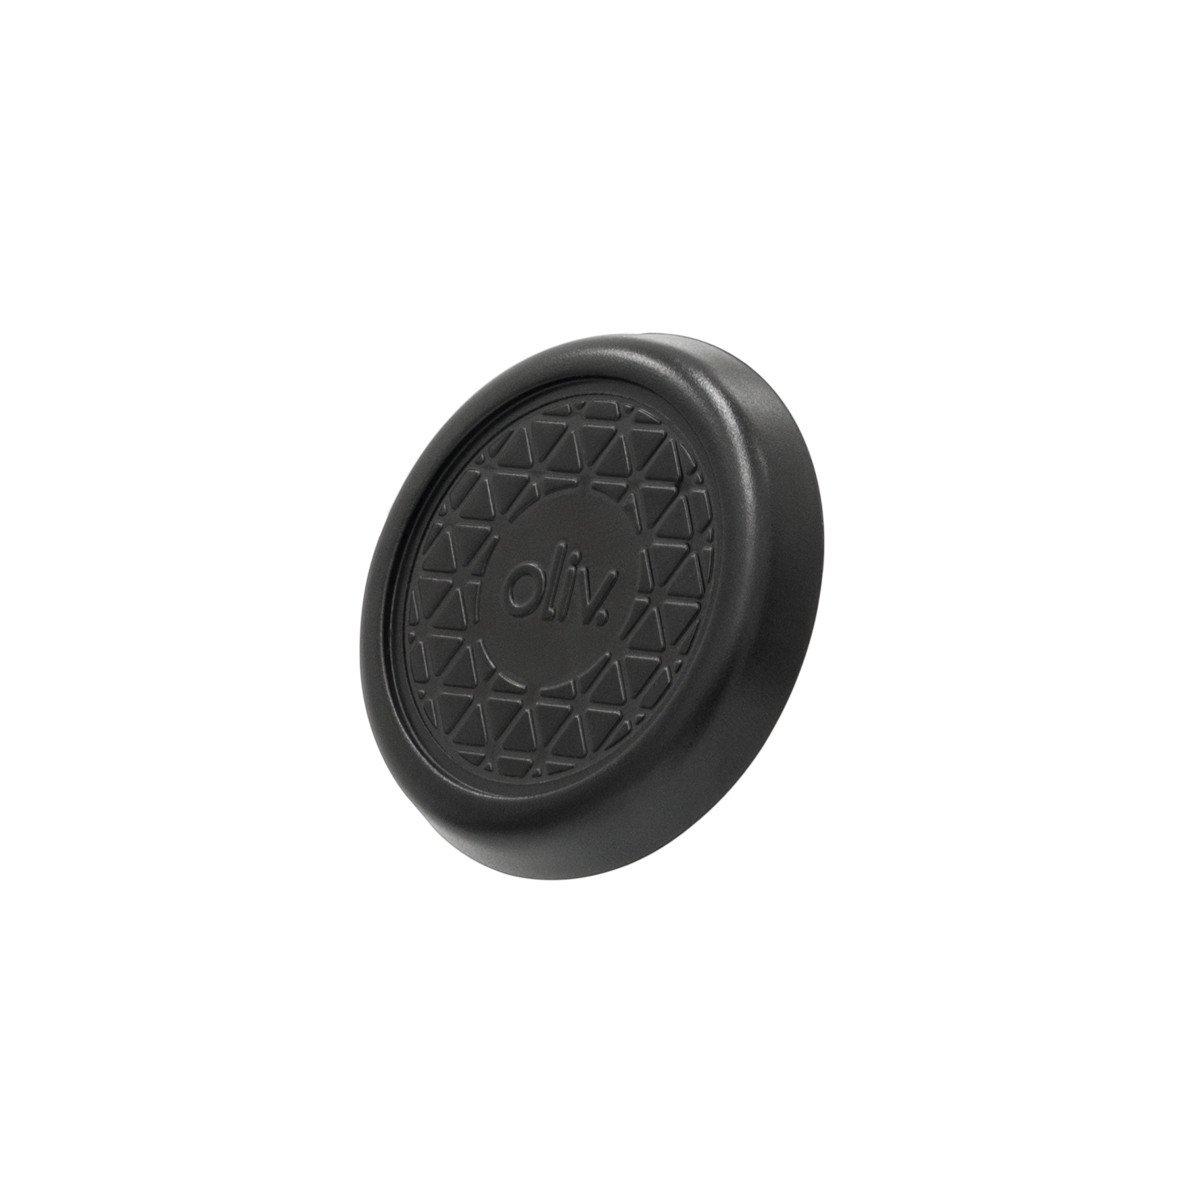 Oliv Button Base